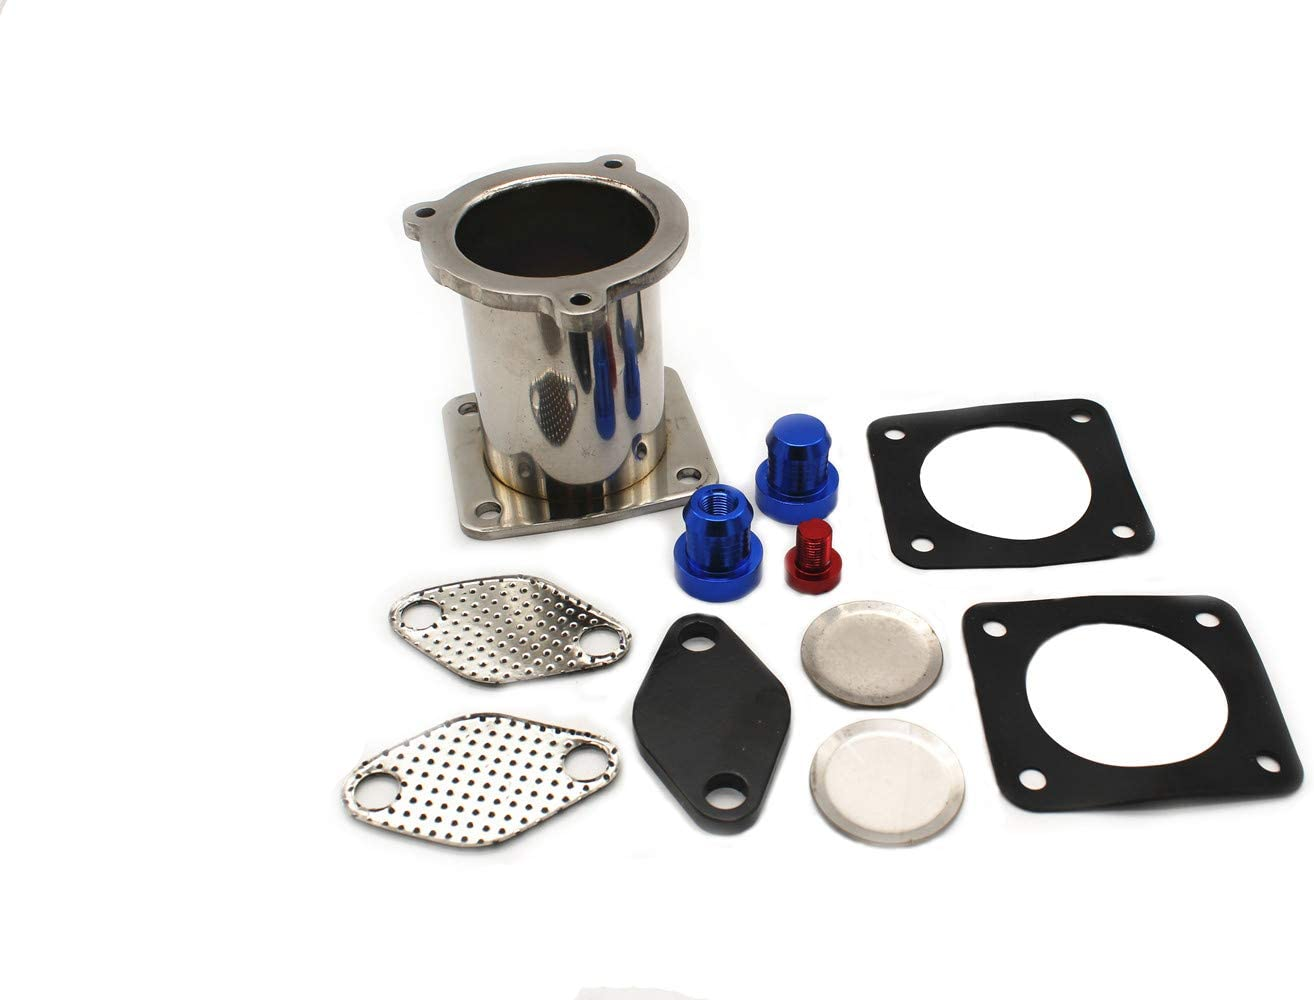 TAKPART EGR Ausbau Reparatursatz AGR /& Cooler Delete Removal Kit f/ür 5er E60 E61 E61N 535D 520i